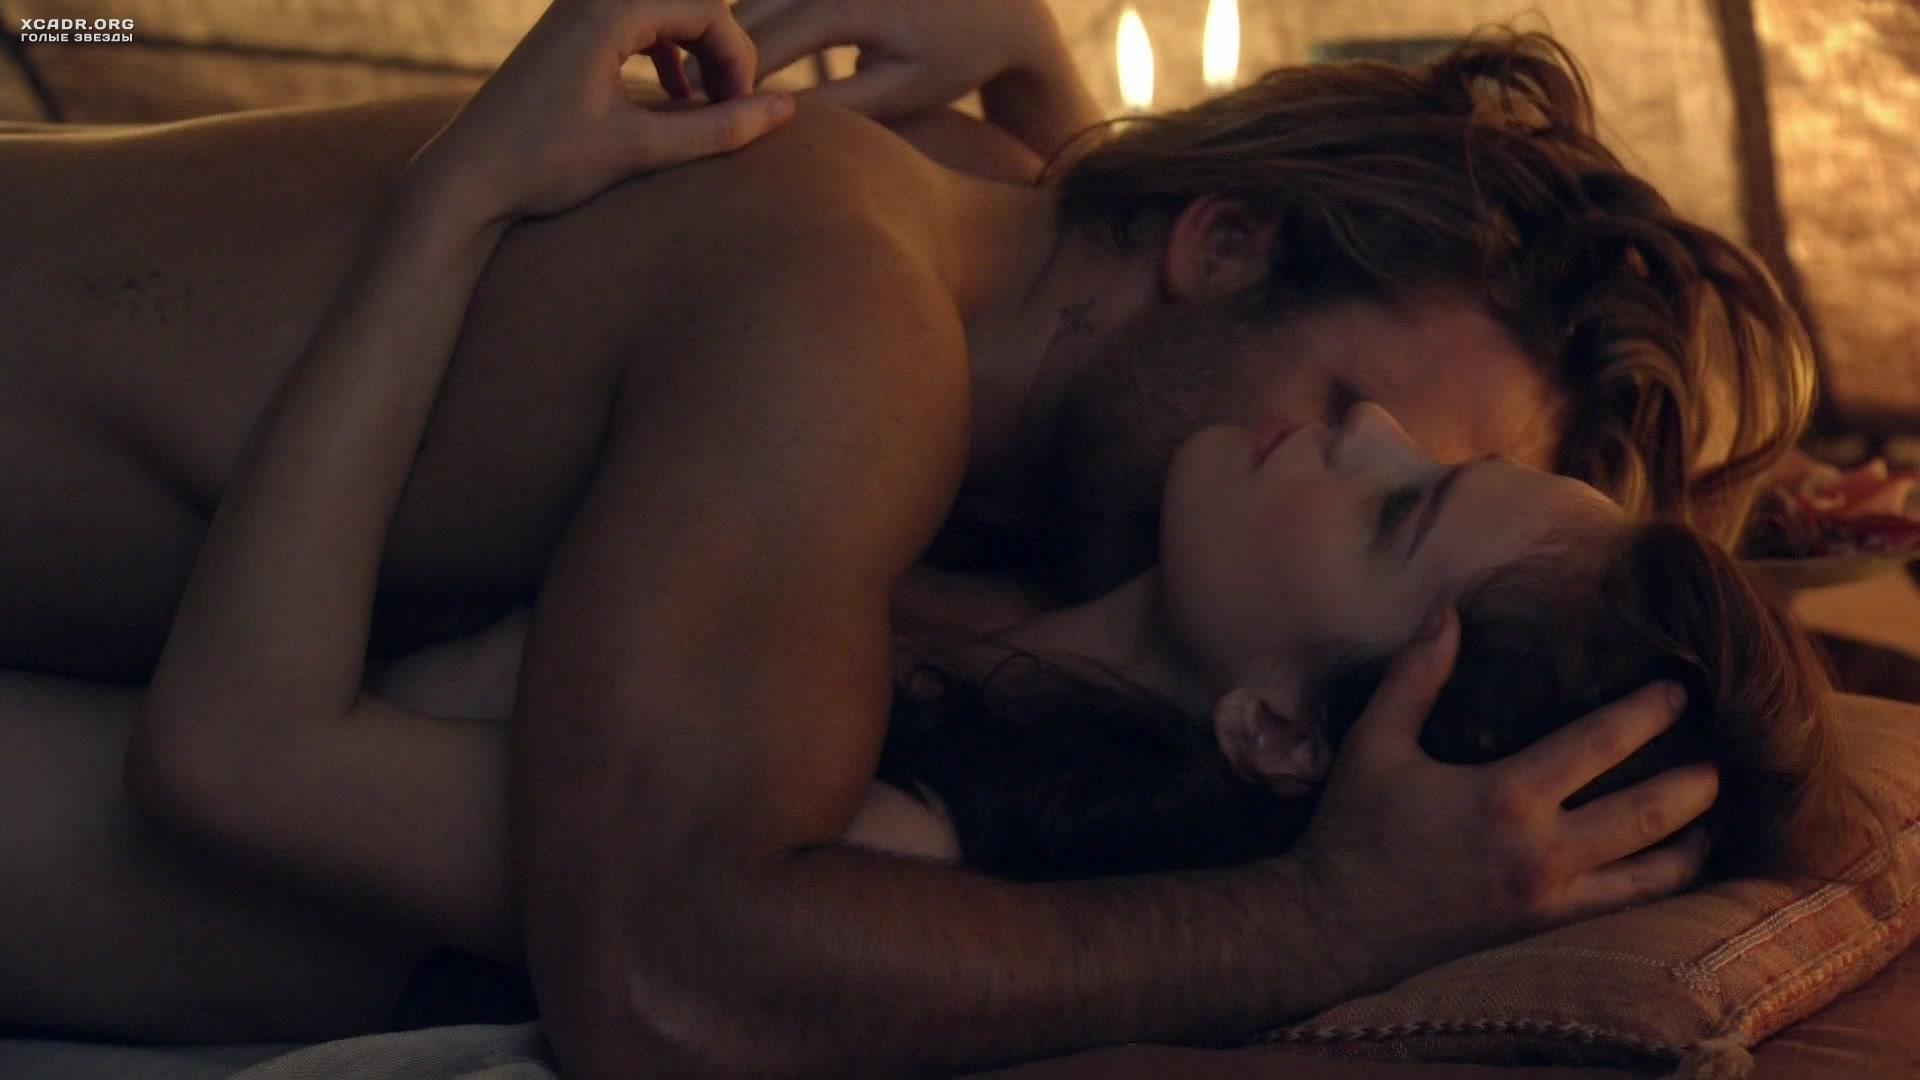 seks-s-innoy-serpokrilovoy-doma-video